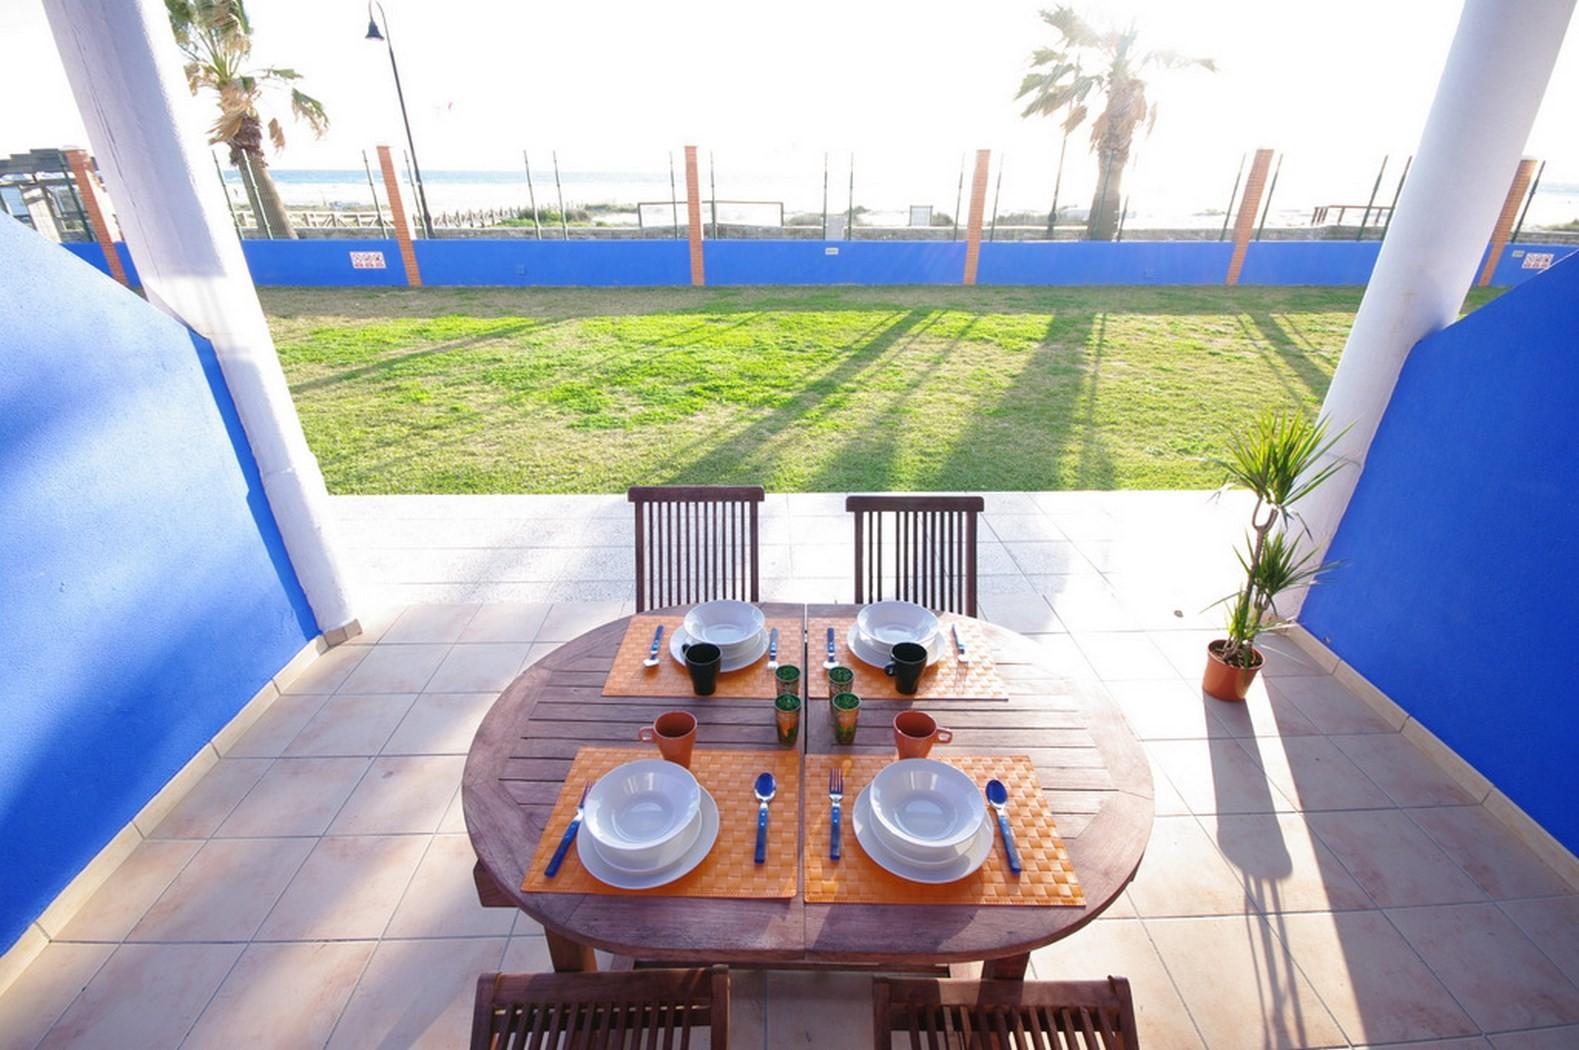 Apartments in tarifa 138 apartamento a pie de playa en tarifa - Tarifa apartamentos baratos ...